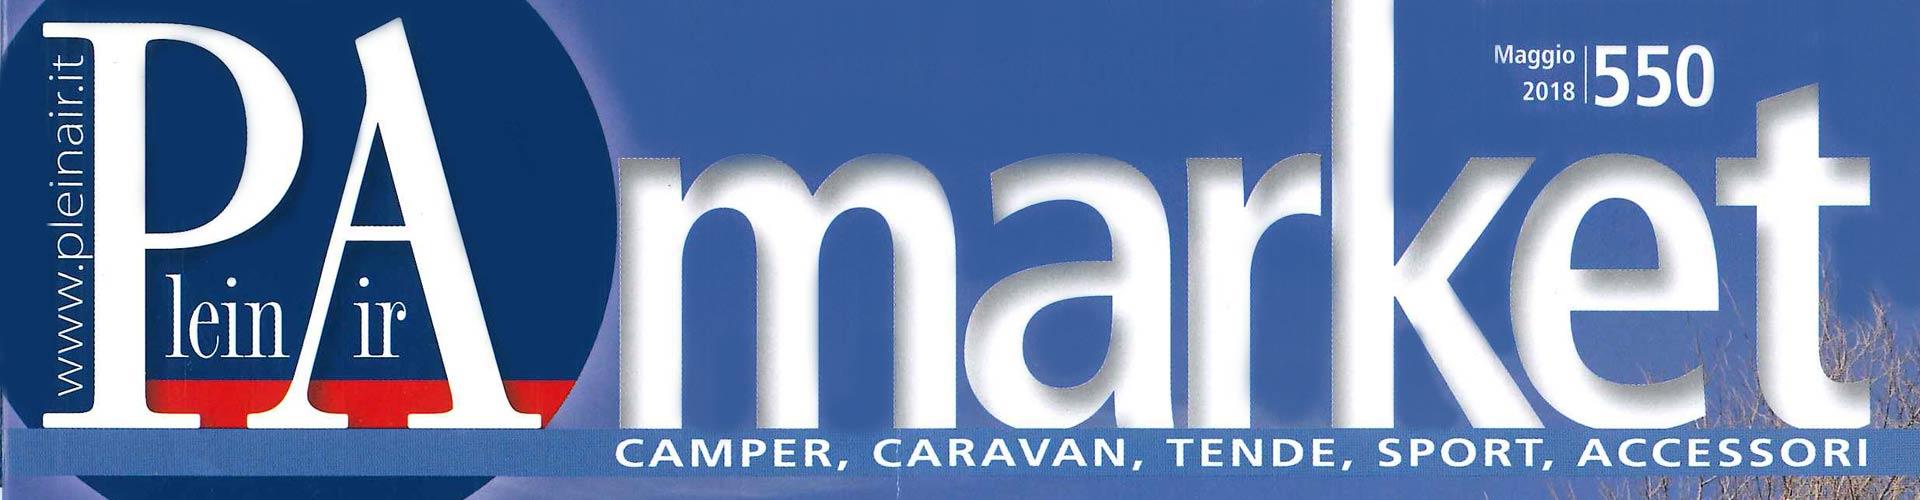 Camper Assandri sulla rivista Plein Air Market